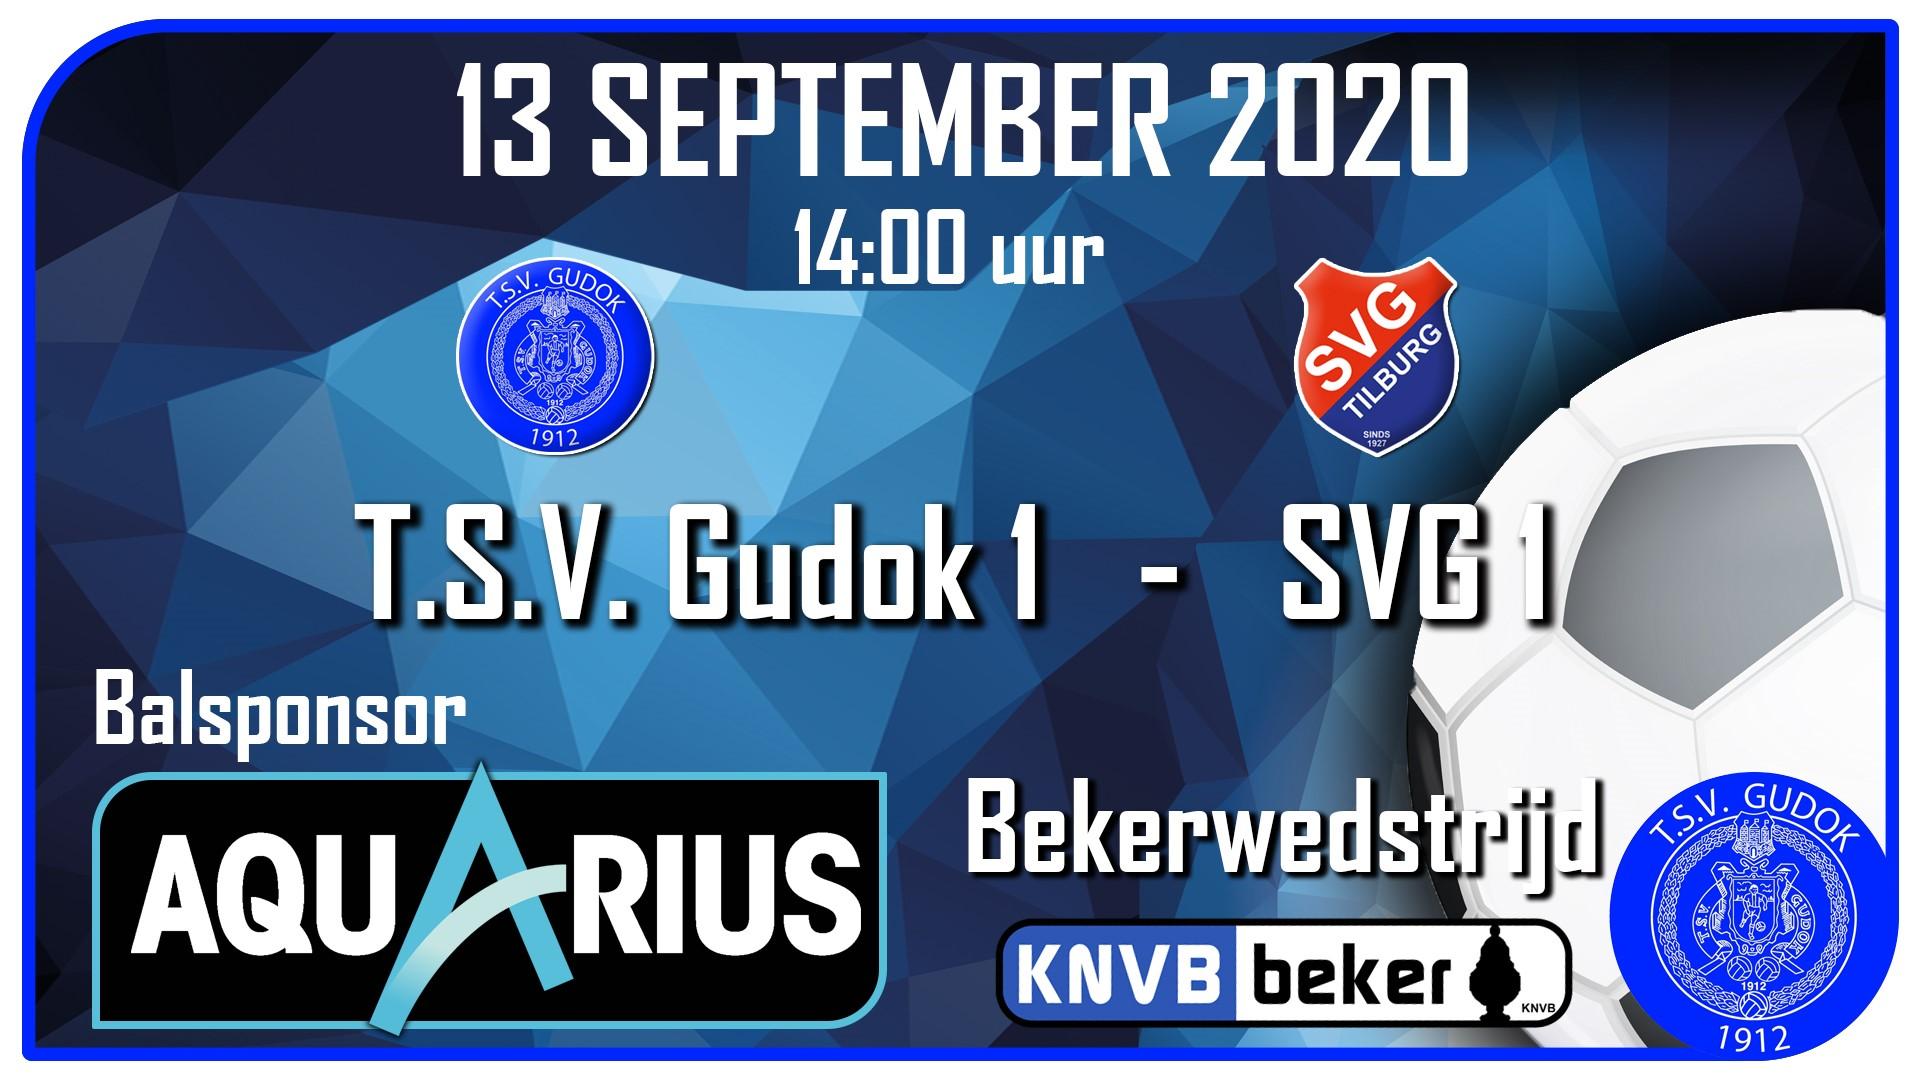 T.S.V. Gudok 1 - SVG 1 (13-09-2020)